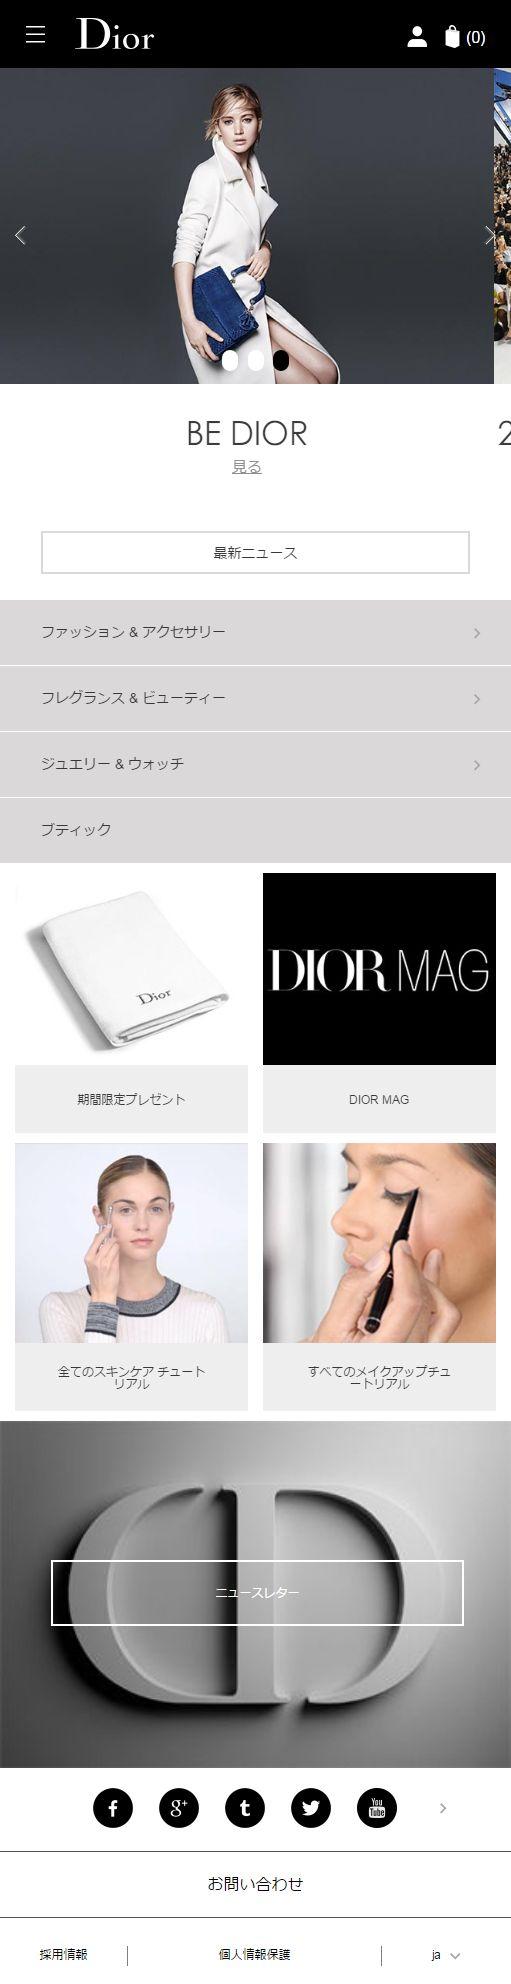 http://m.dior.com/ja_jp/home.html